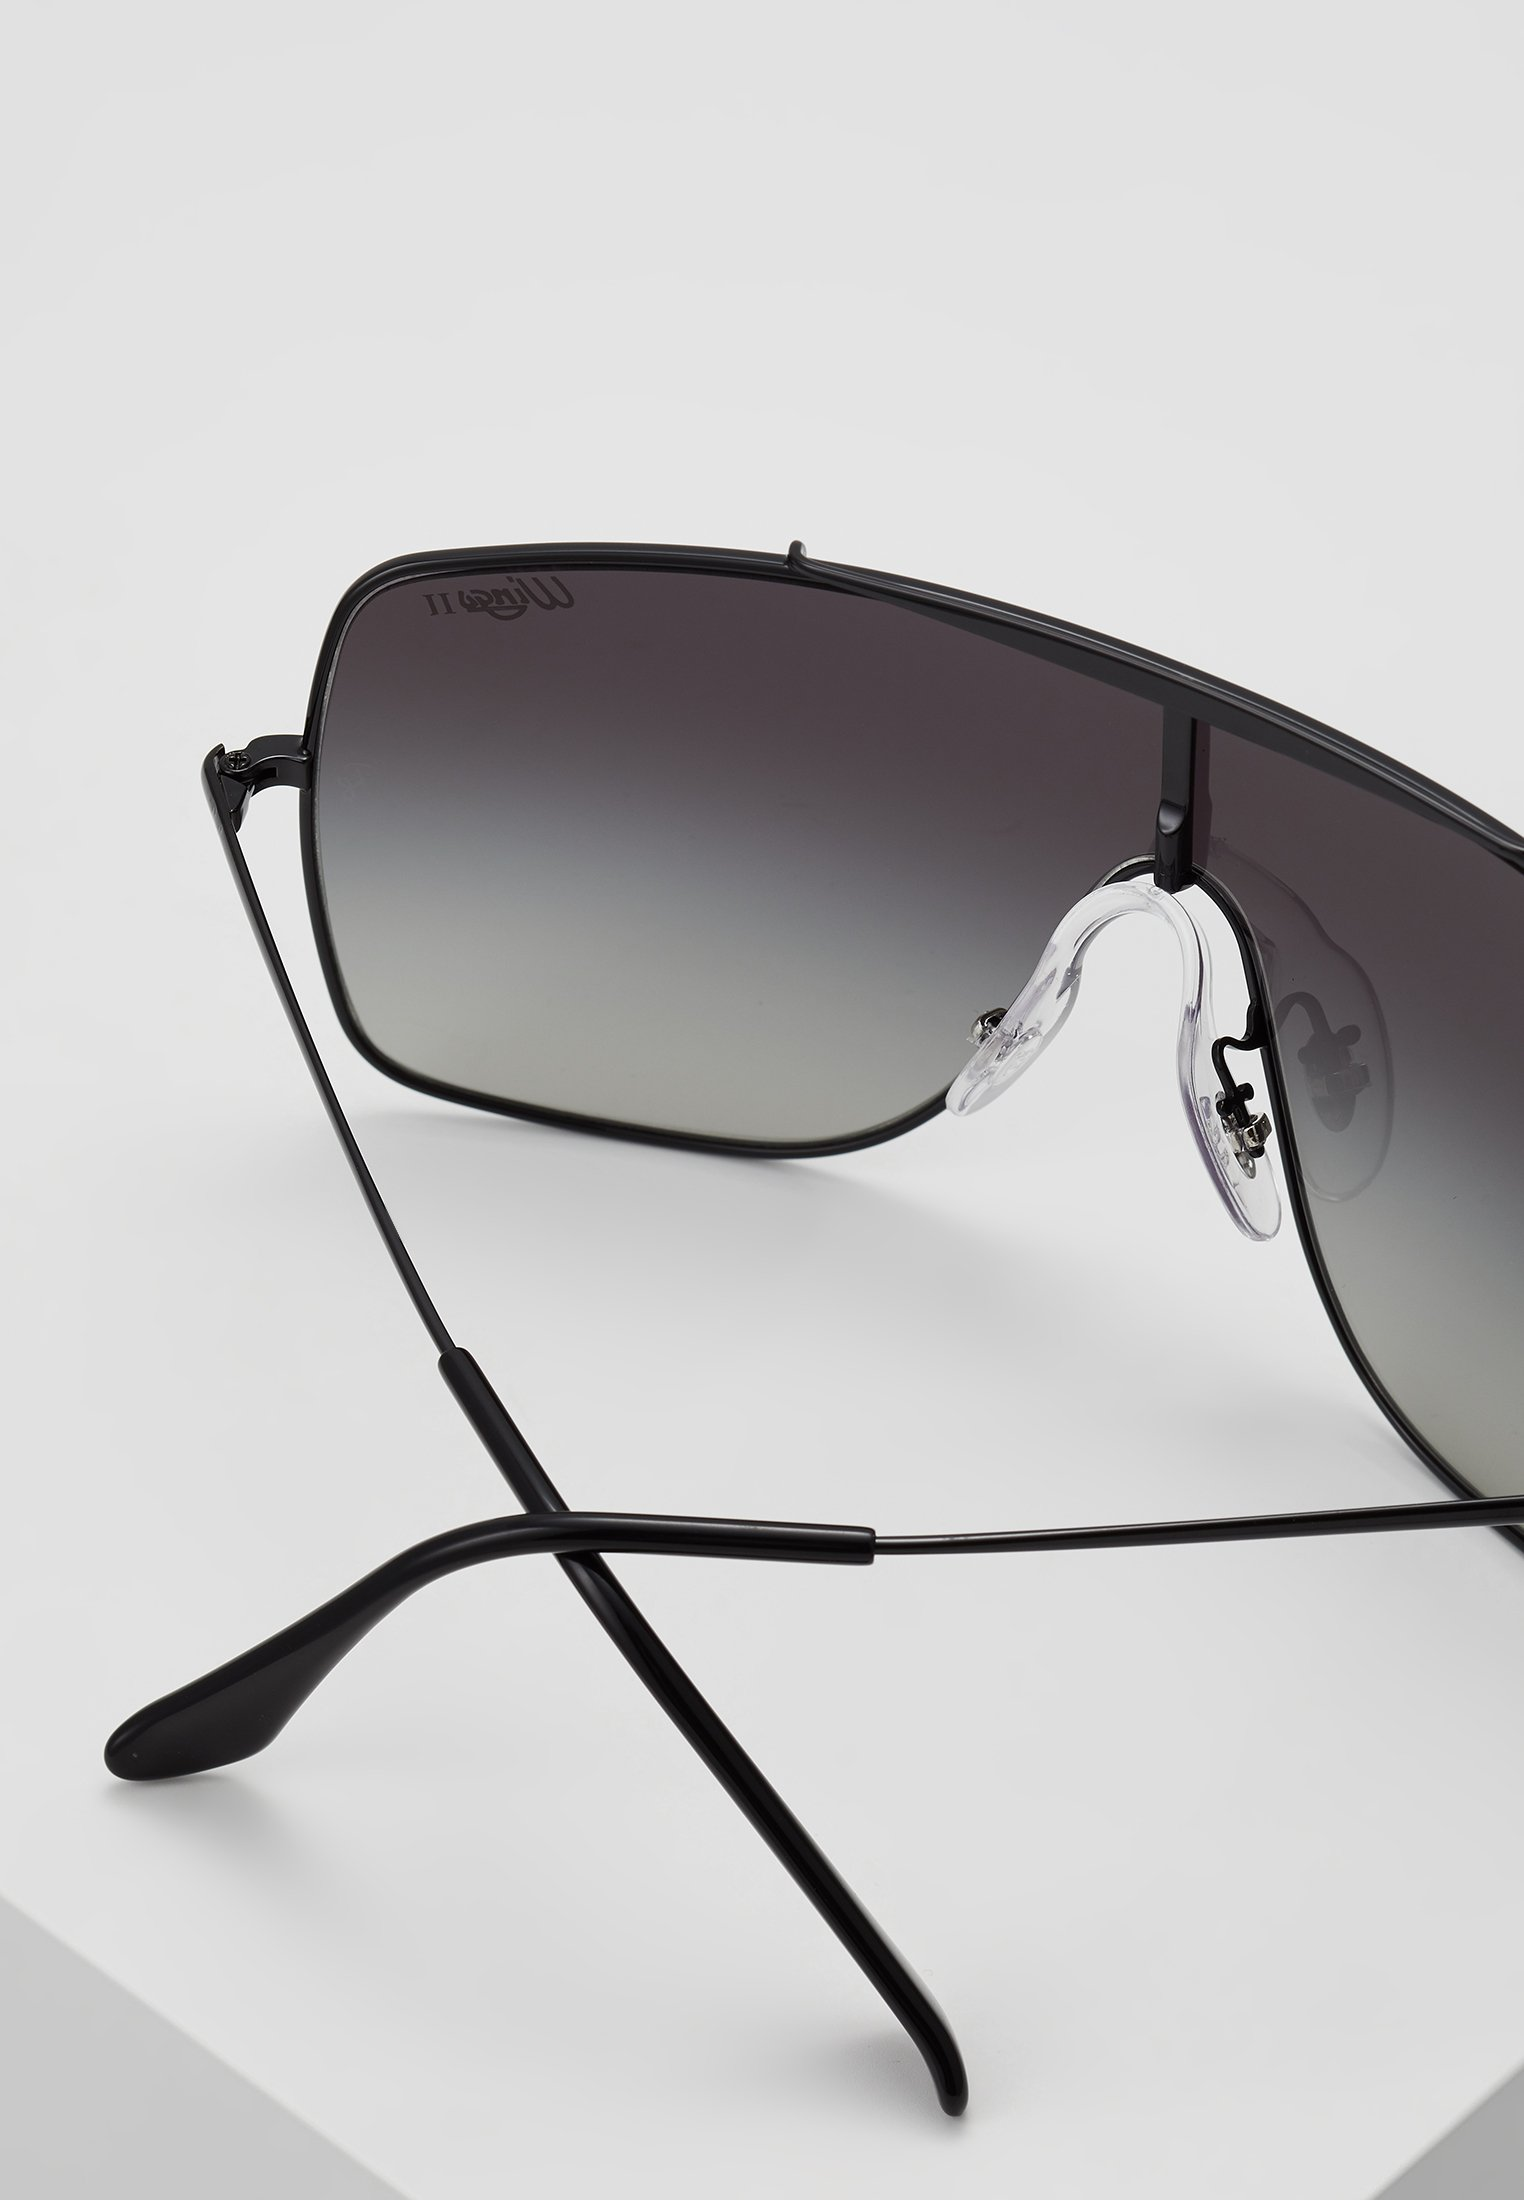 Ray-Ban WINGS II - Sonnenbrille - black/schwarz - Herrenaccessoires uakp7